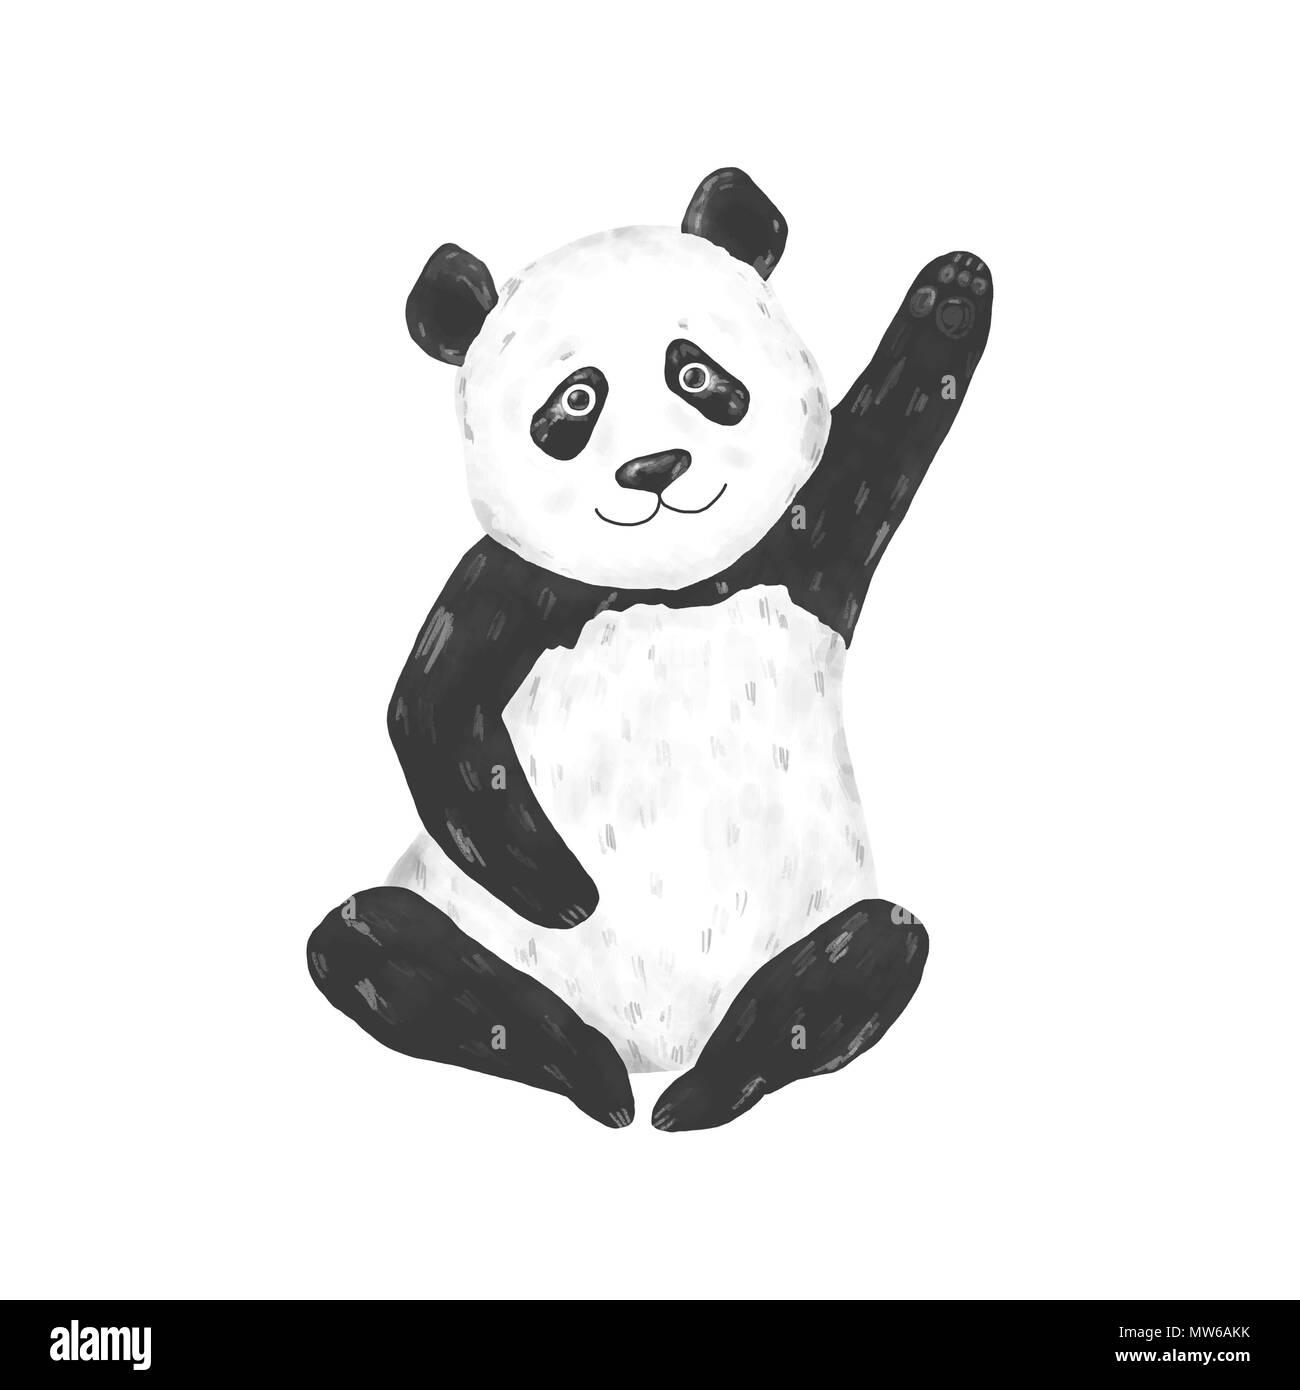 Panda Clip Art Drawing Animal Black Bear Character Funny Illustration On White Background Stock Photo Alamy